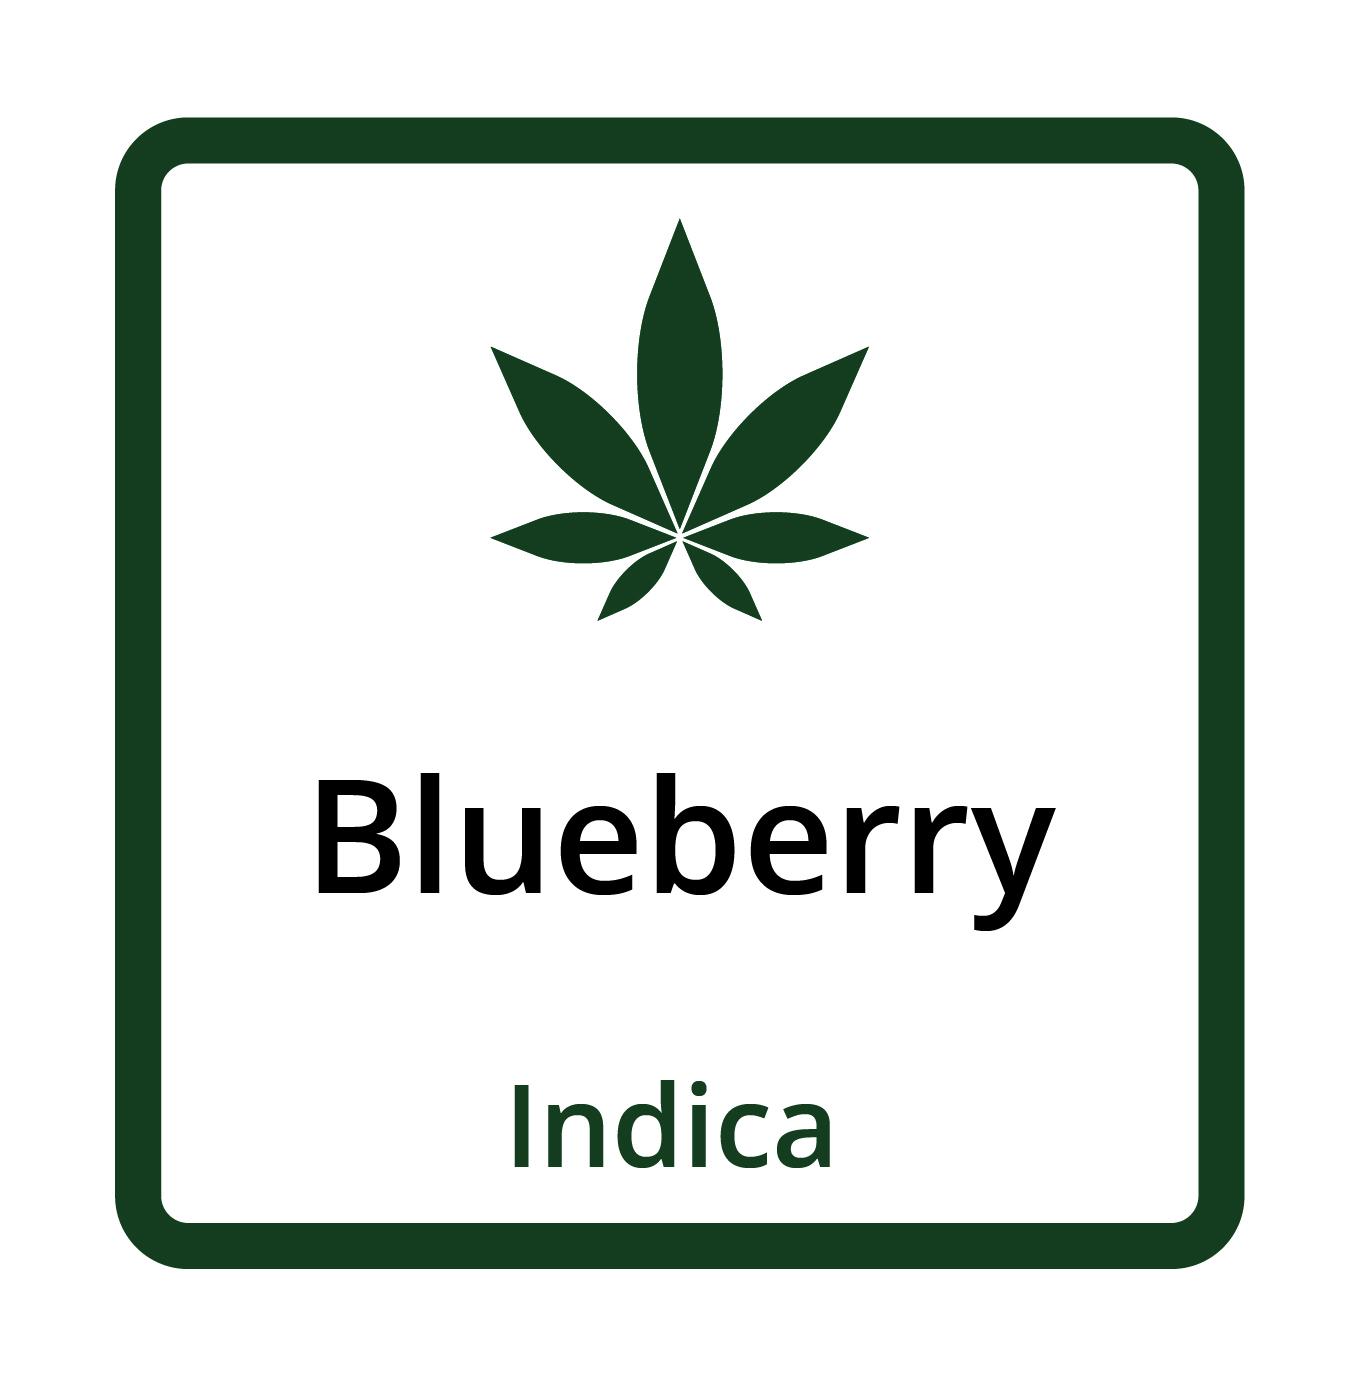 Blueberry (Indica)